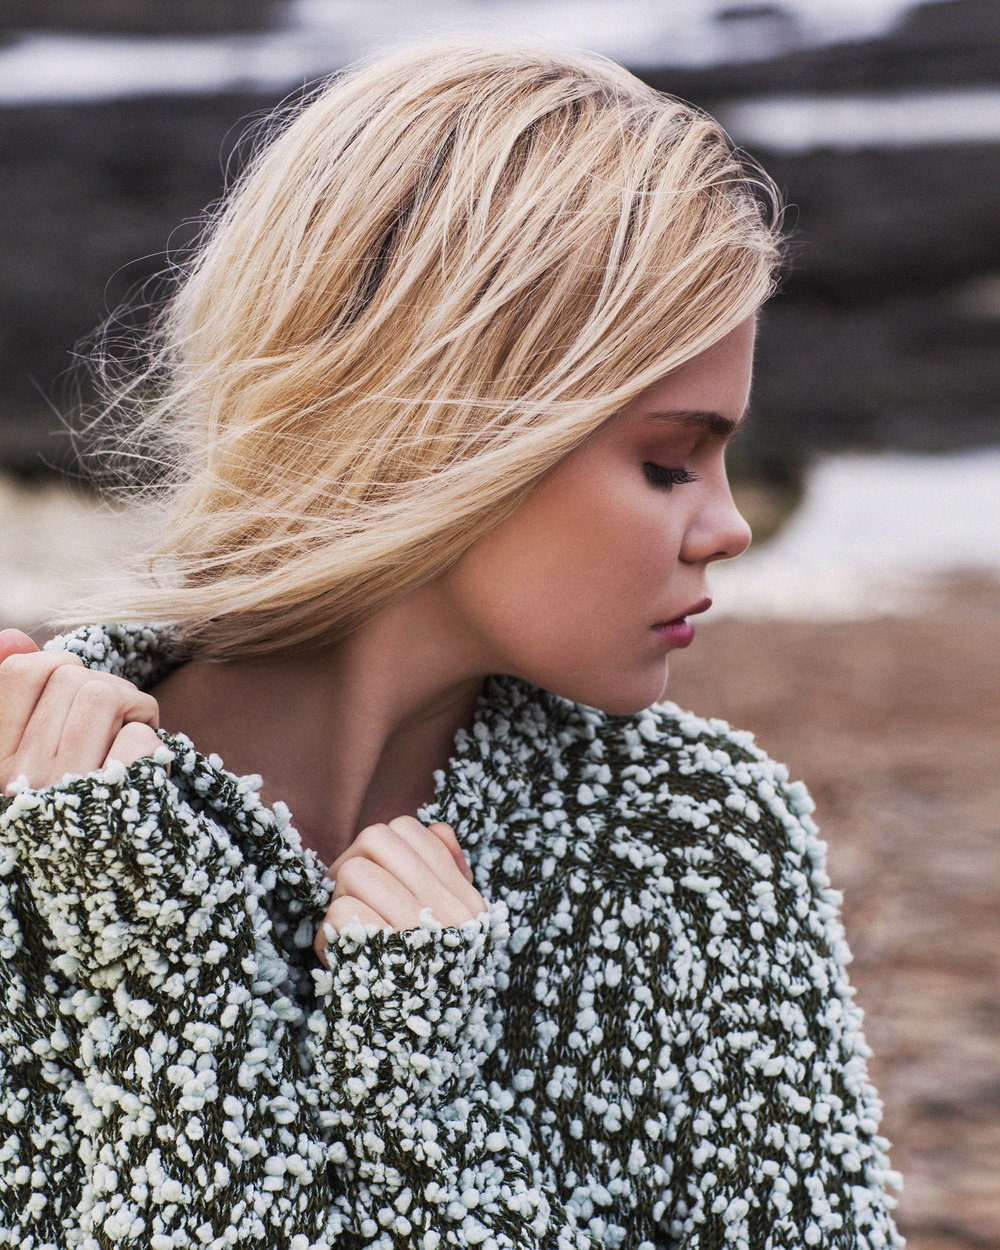 Knitwear: Samsøe & Samsøe